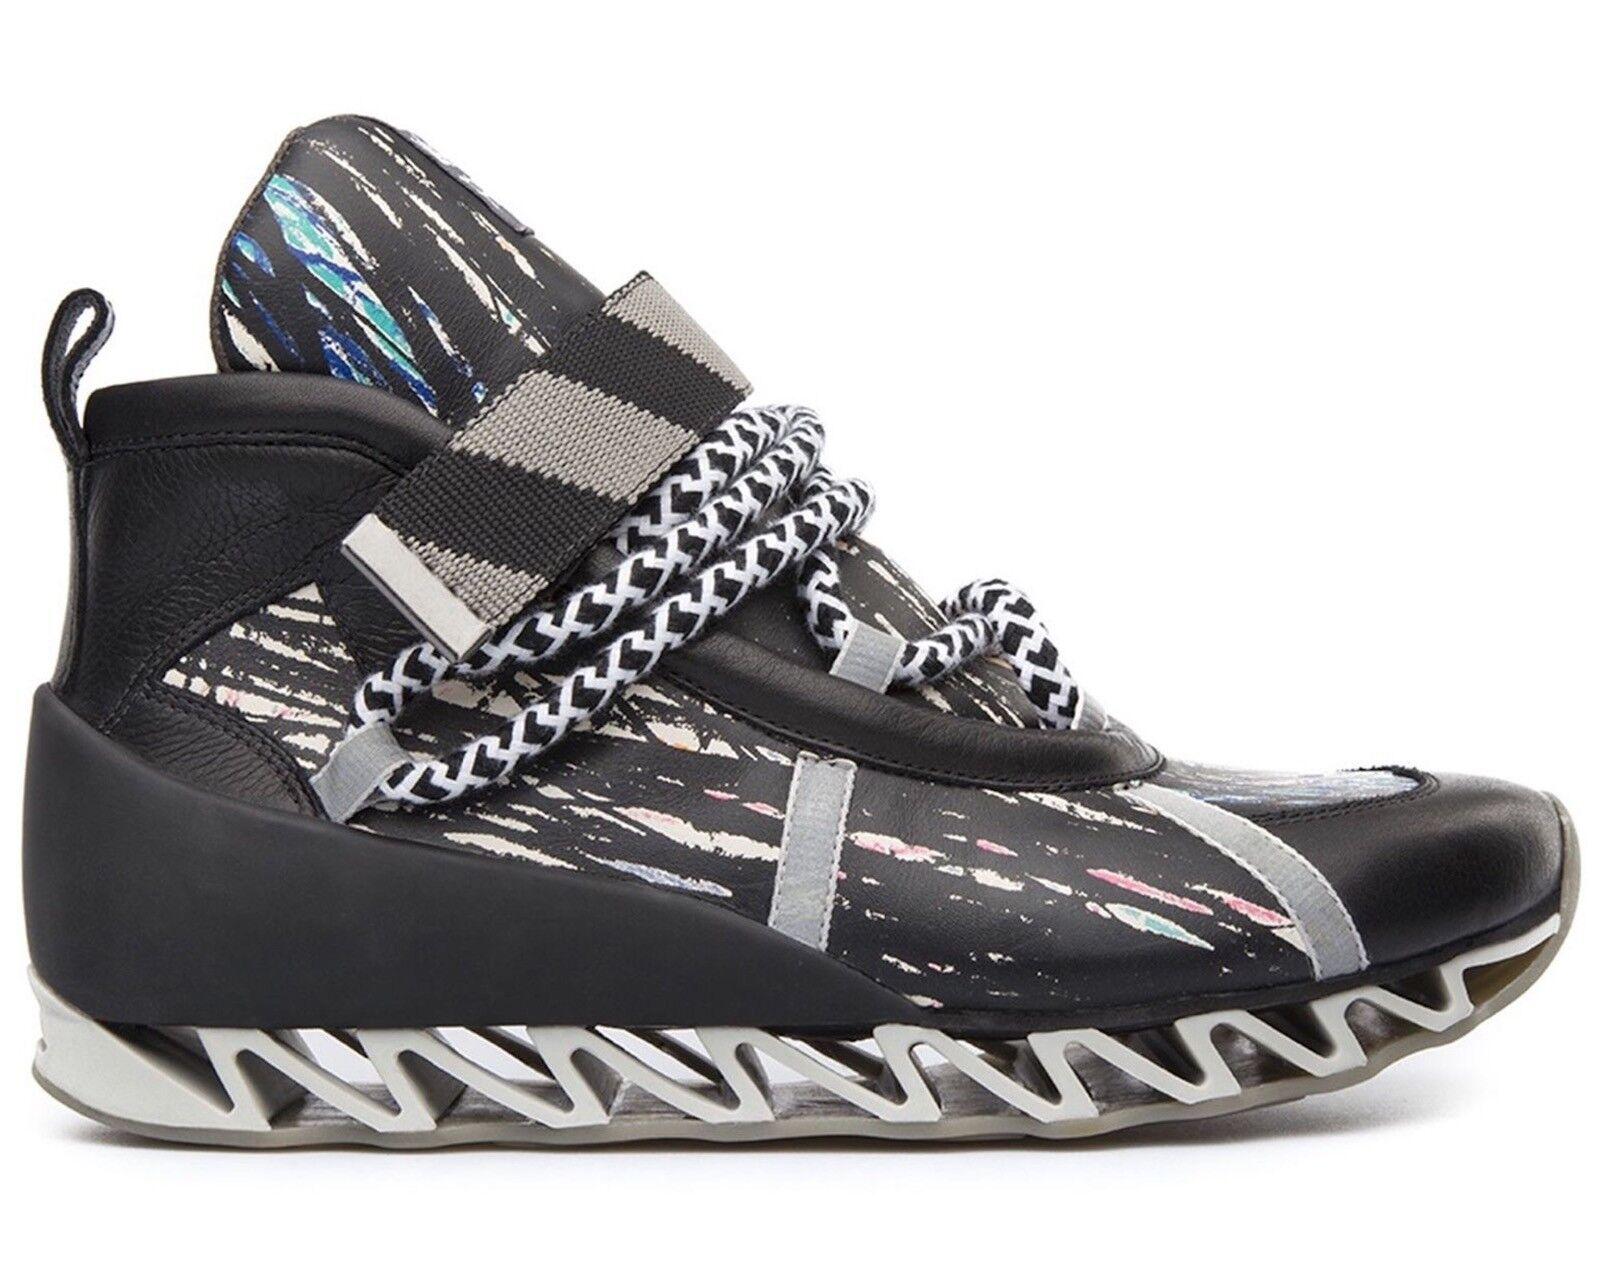 320 Bernhard Willhelm X Camper US 9 EU 42 Together Himalayan Sneakers 36514-018